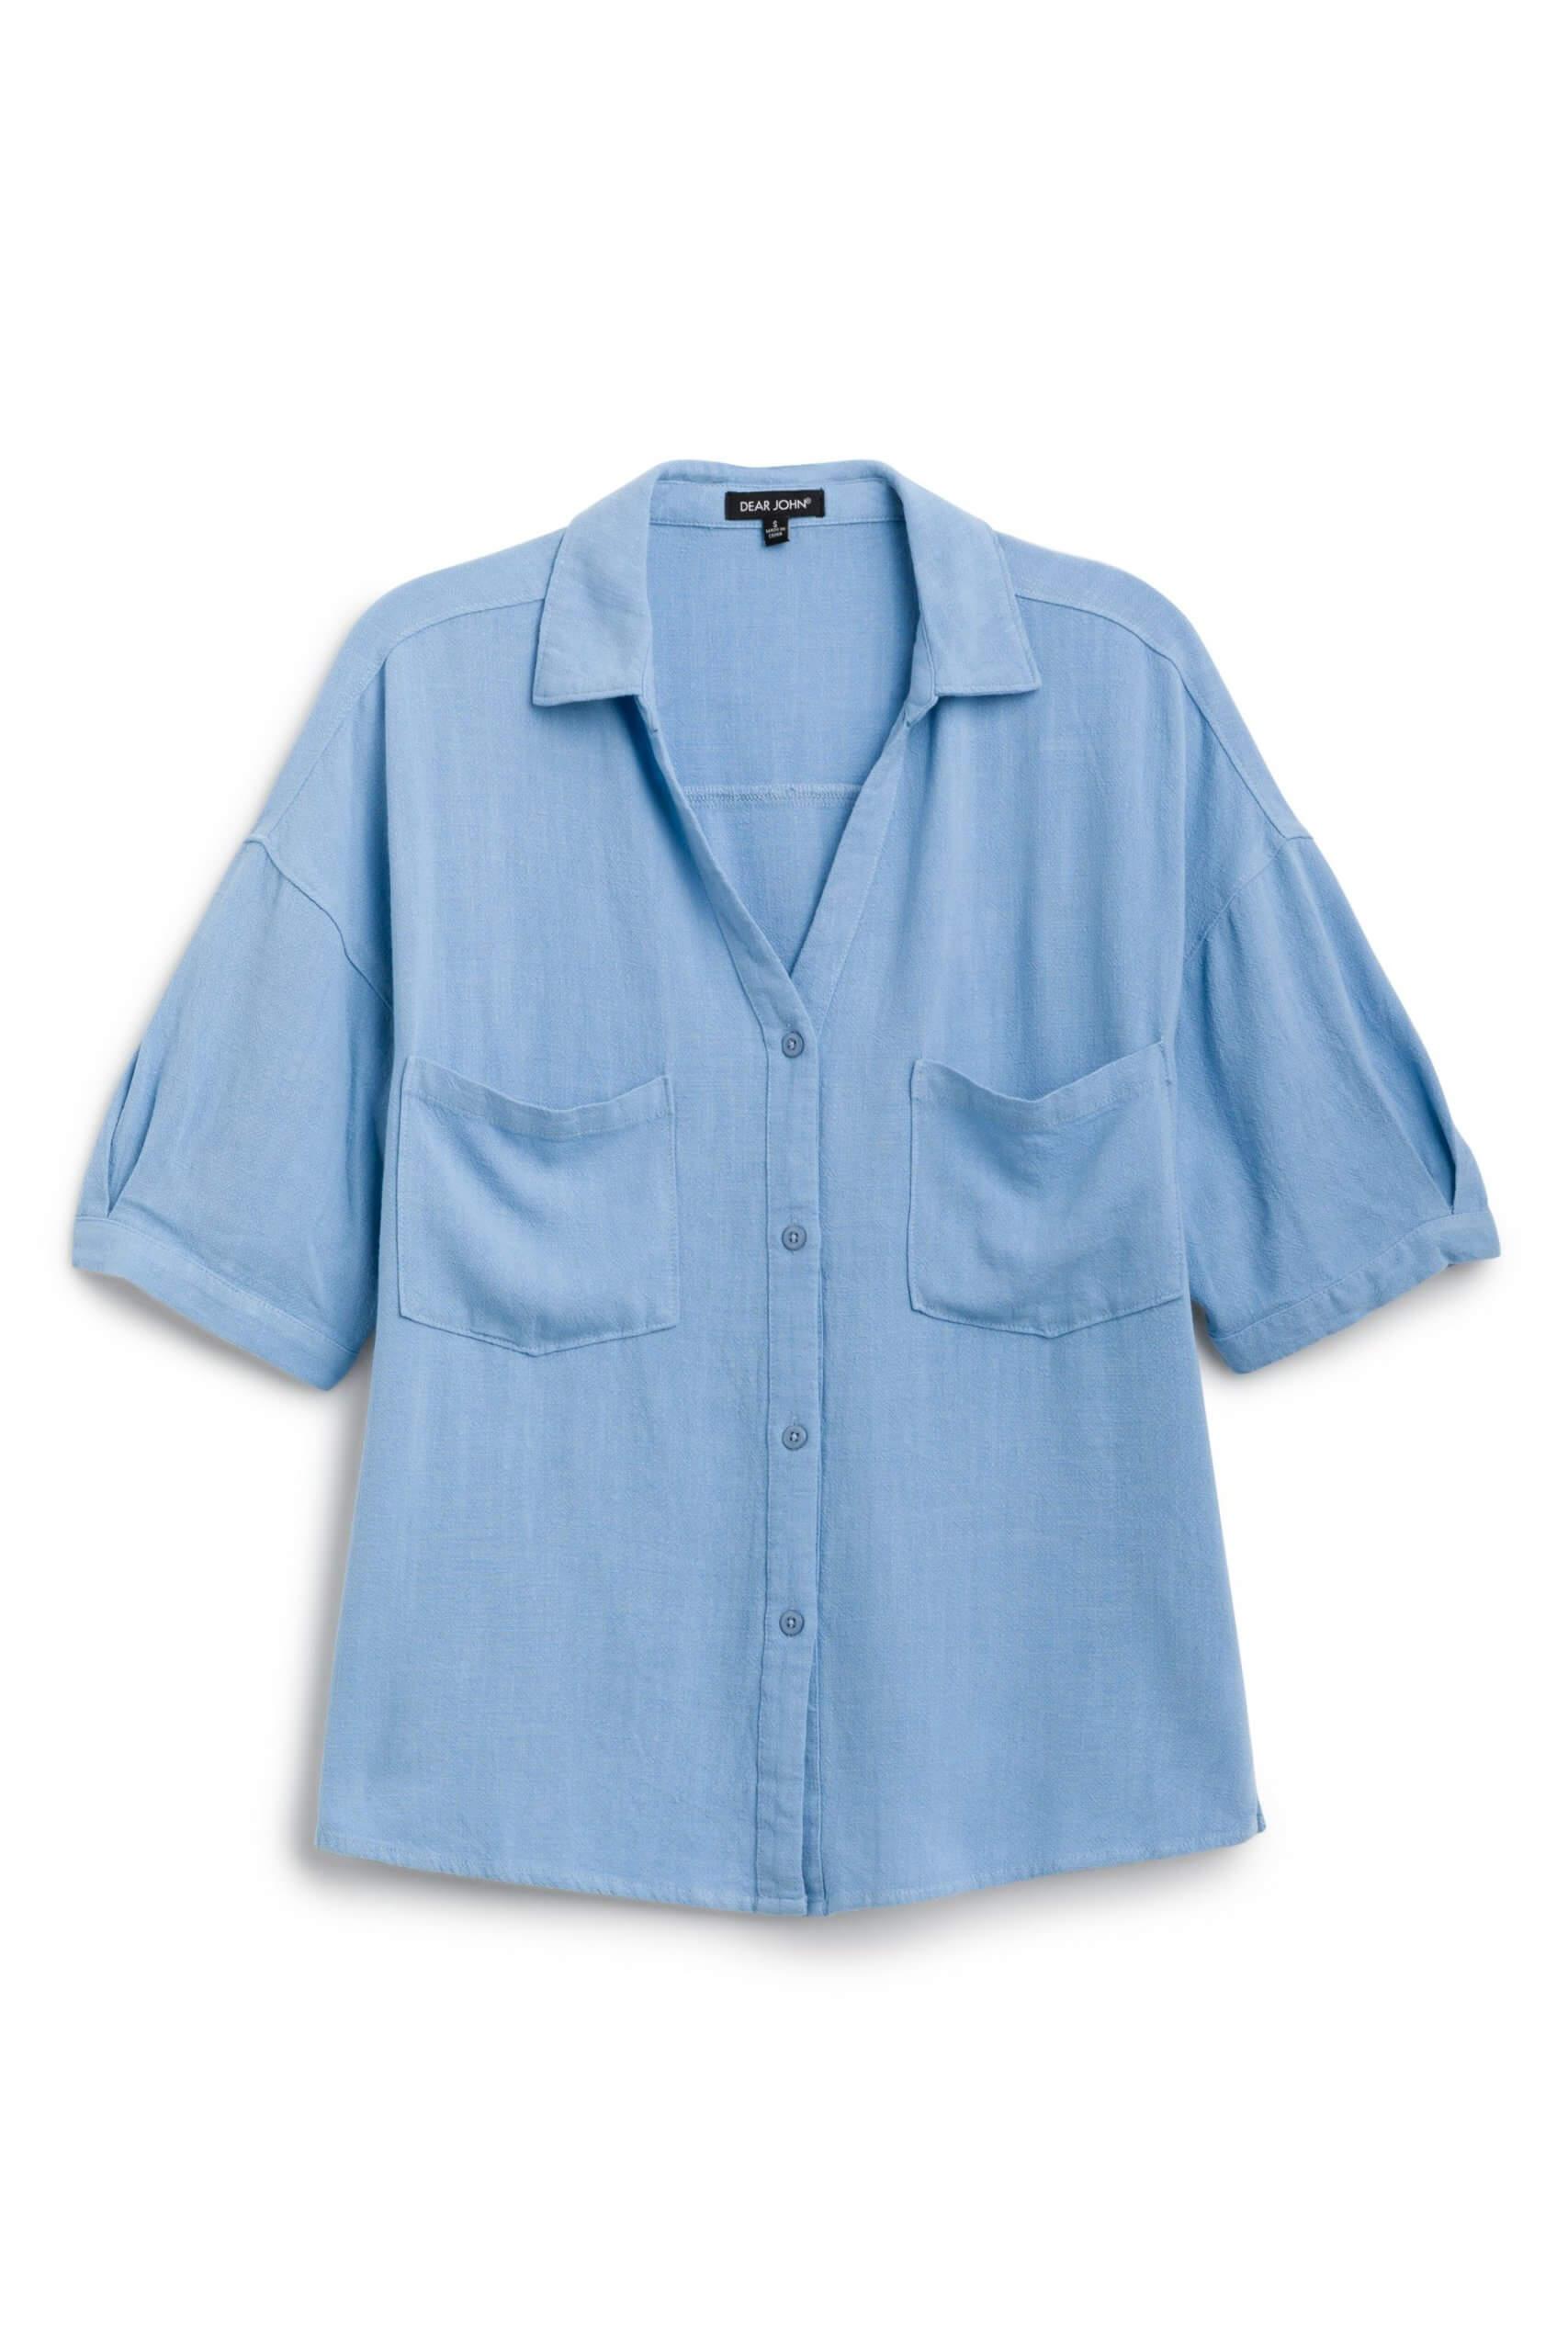 Stitch Fix Women's blue button-down shirt.